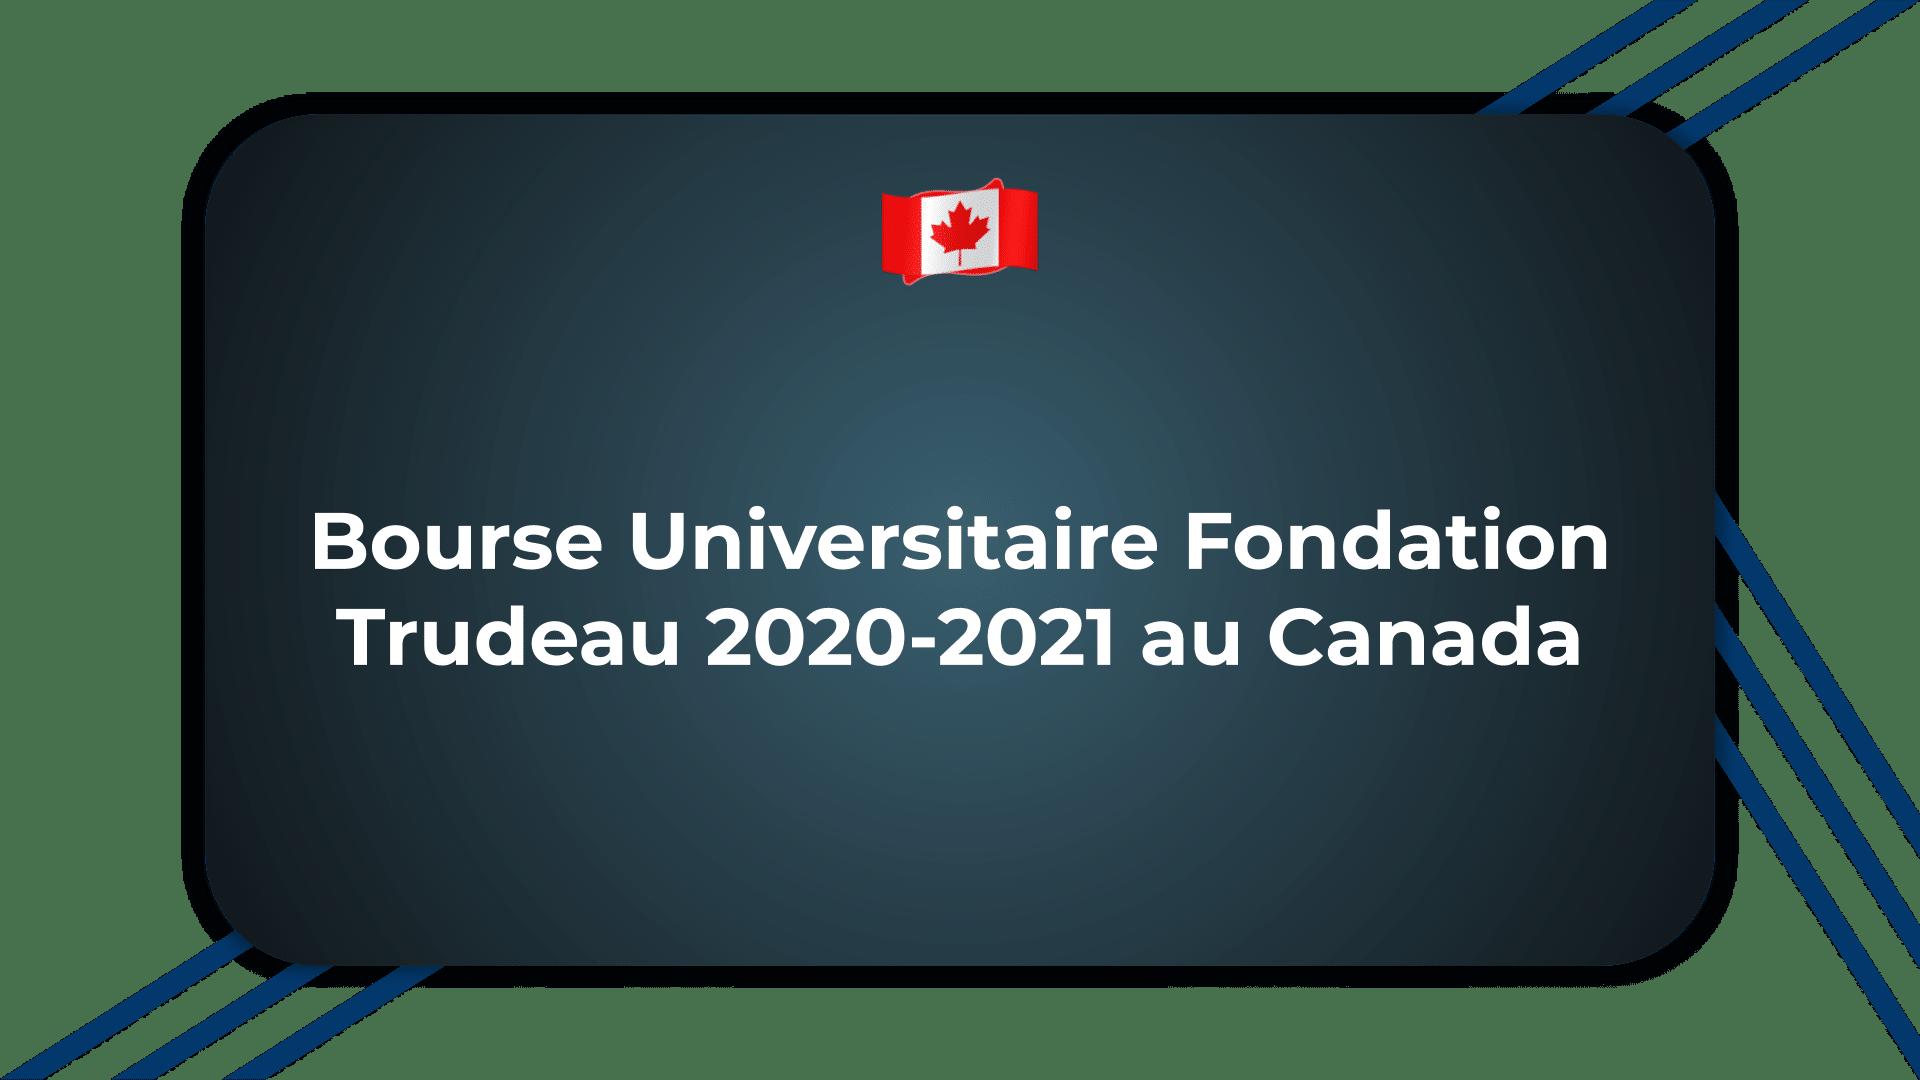 Bourse Universitaire Fondation Trudeau